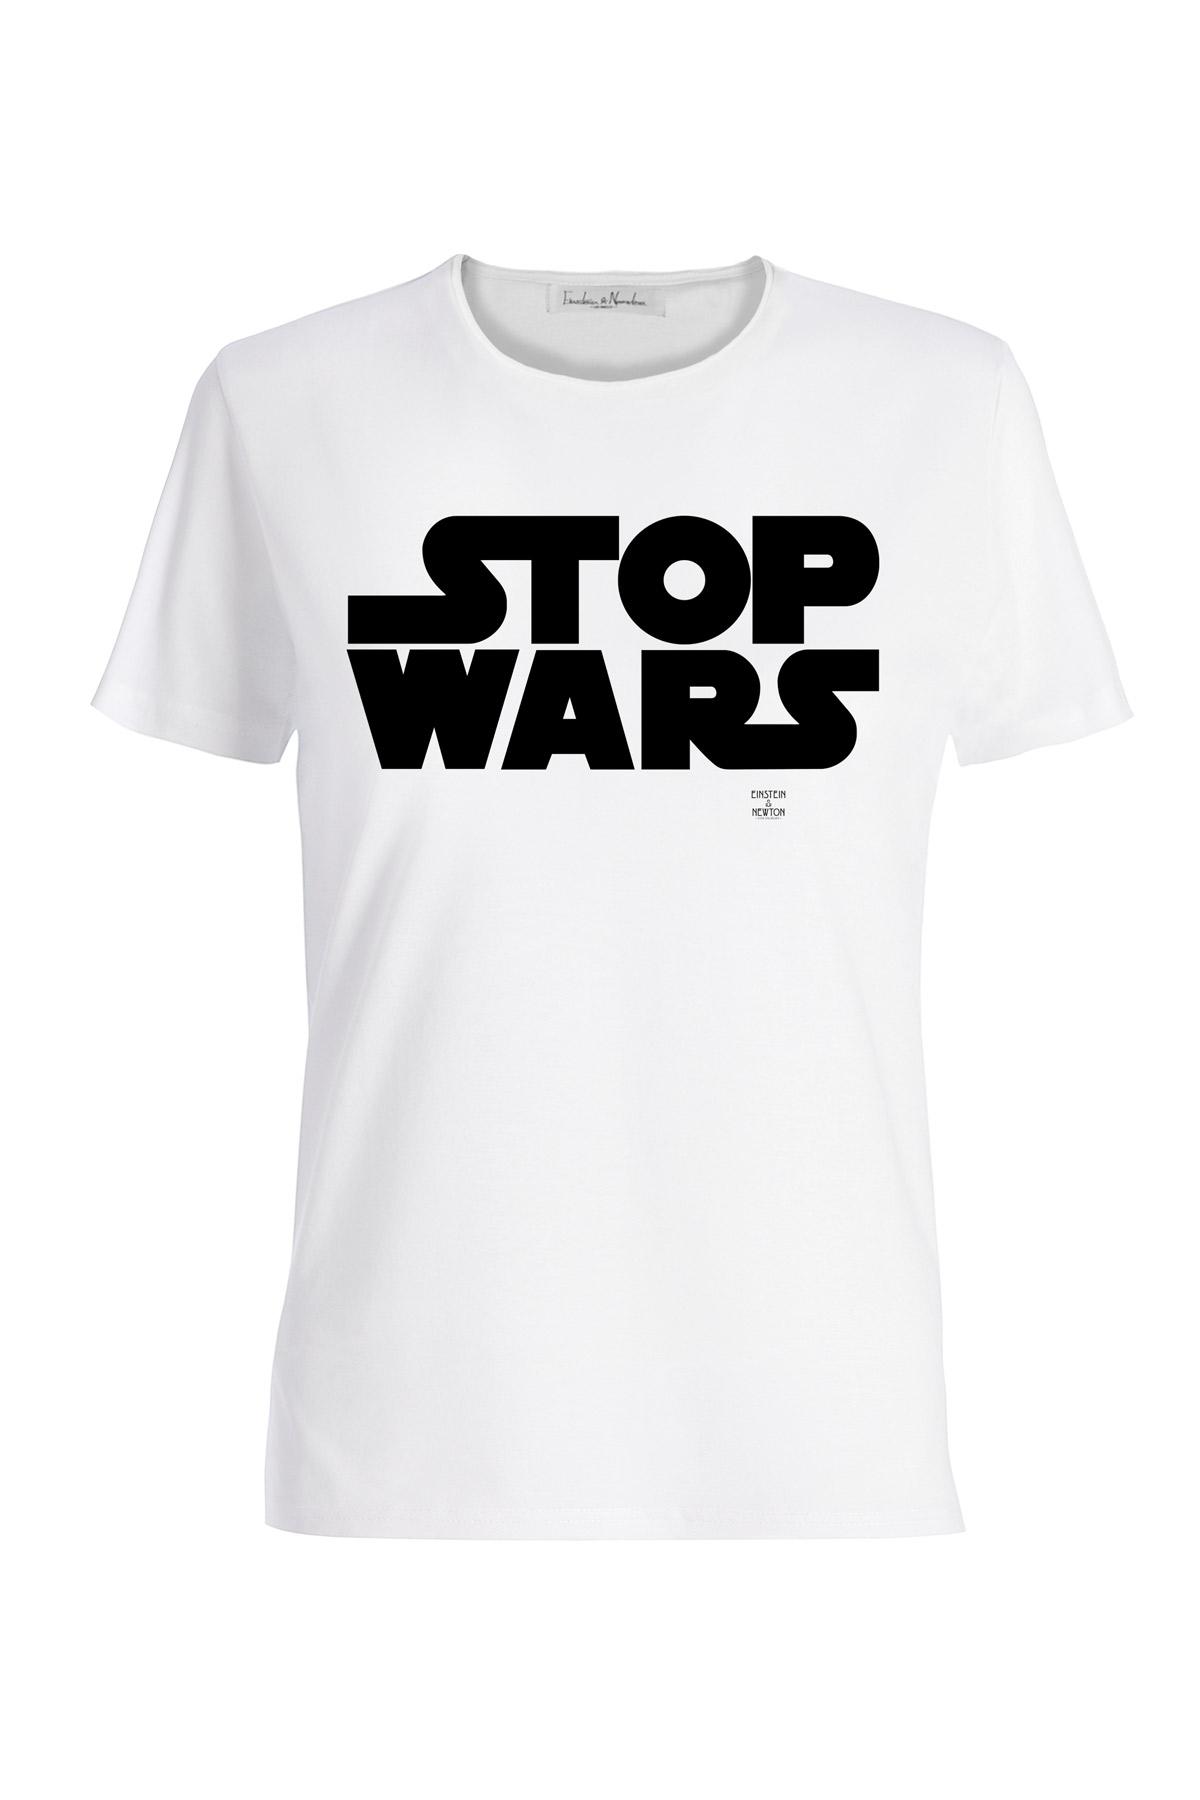 Stop Wars Shirt Rodeo